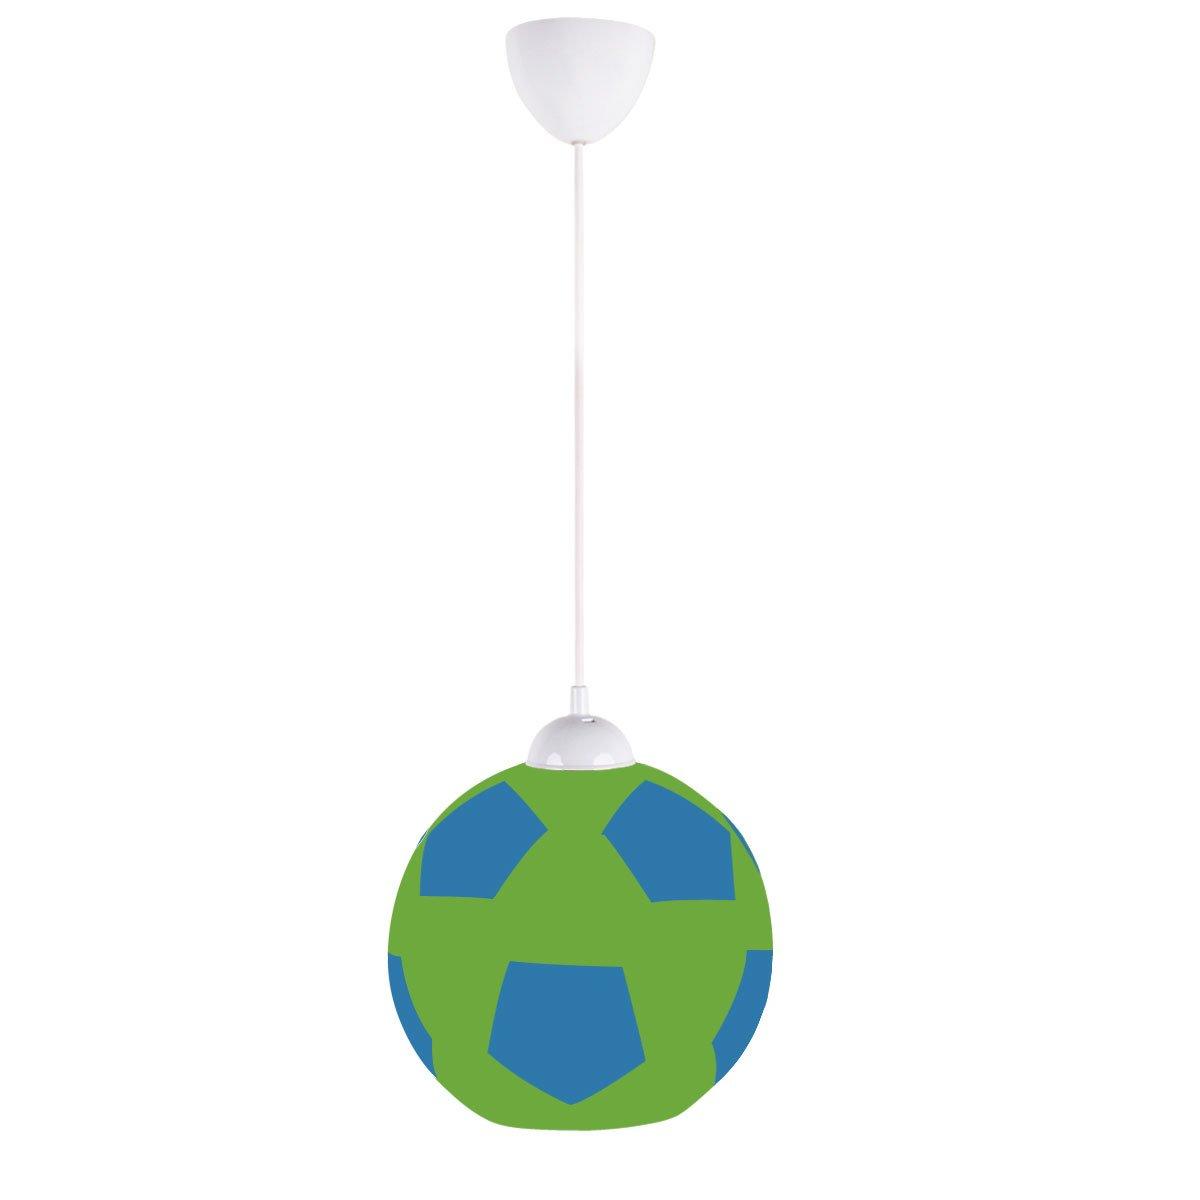 Seattle soccer ball pendant high qaulity blown glass sounders green blue by art win lighting la amazon com